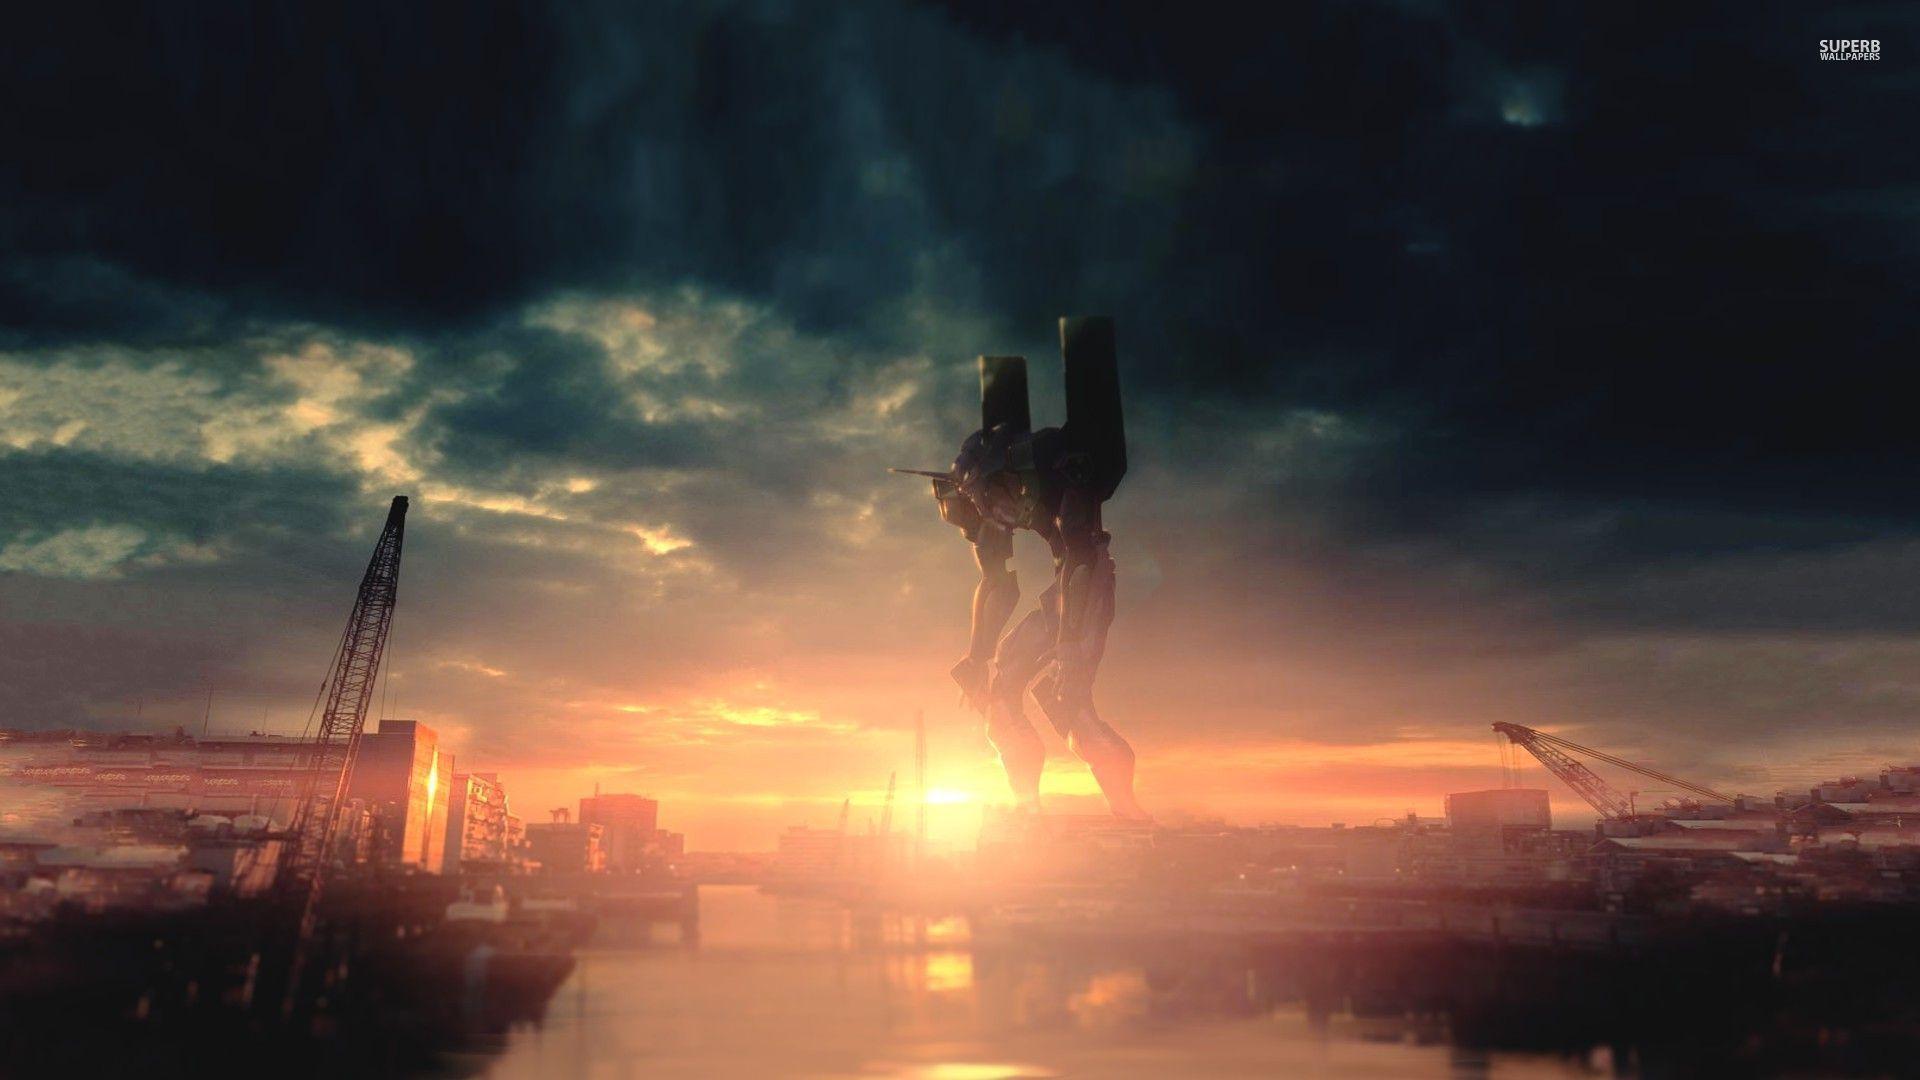 evangelion wallpaper hd anime - photo #18